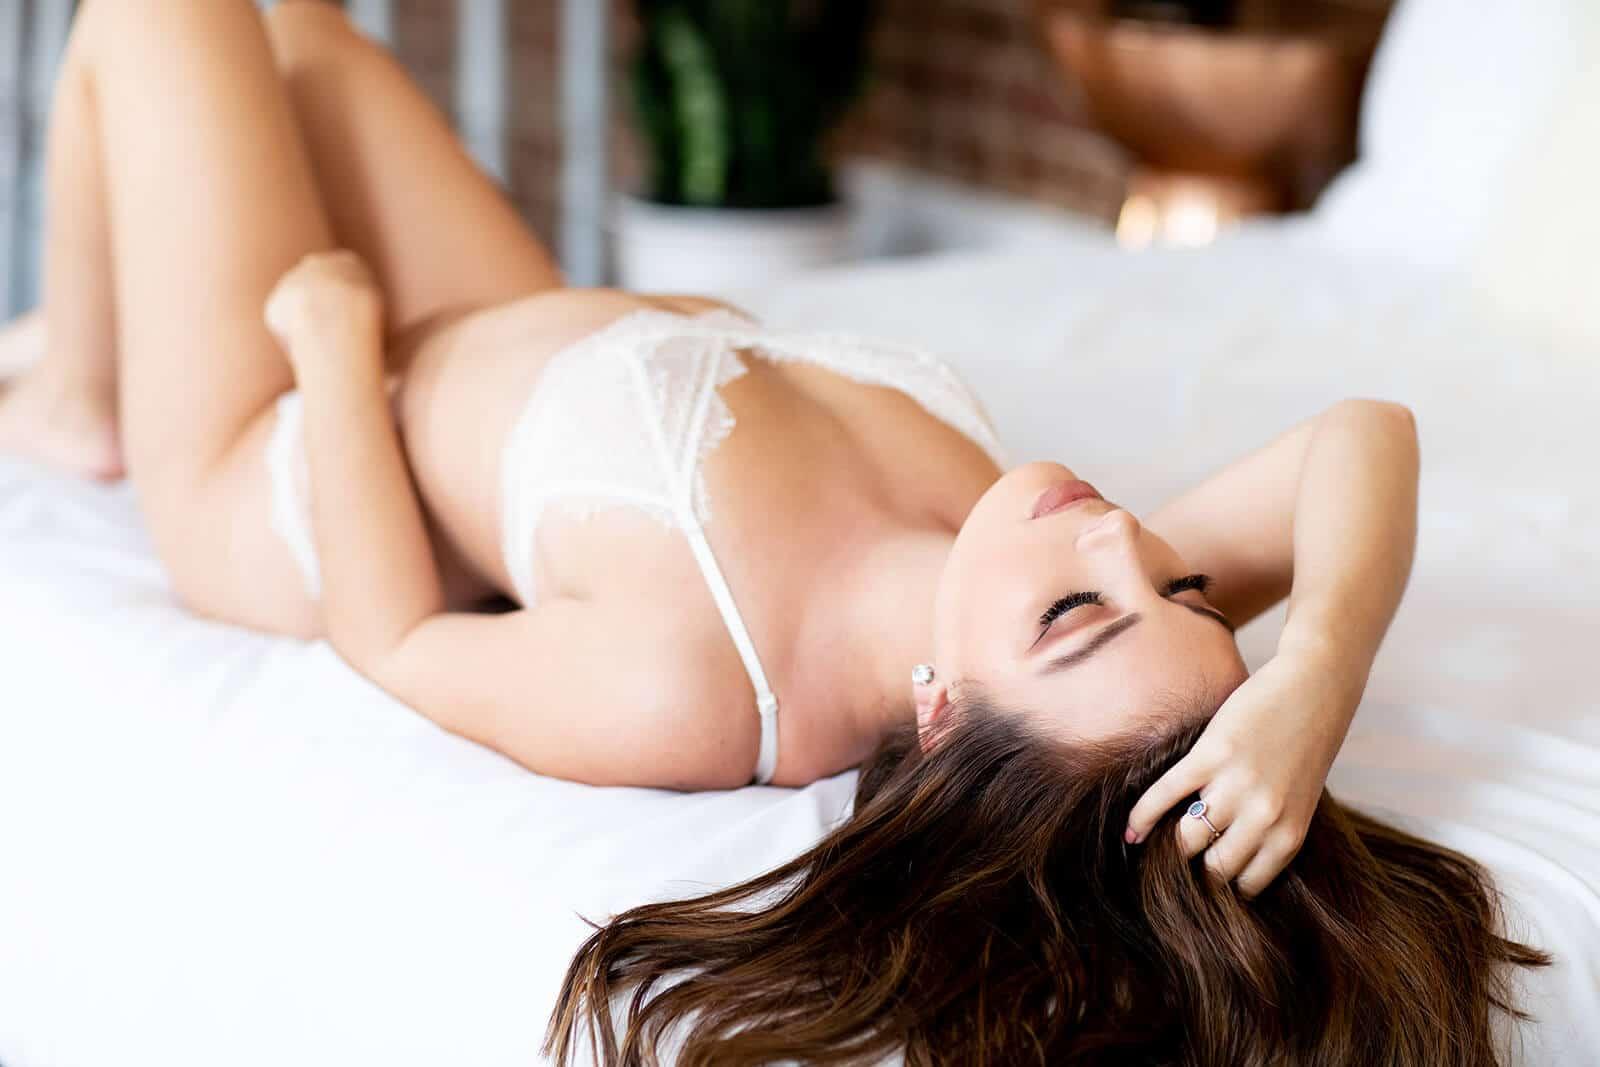 Femme sexy allongée